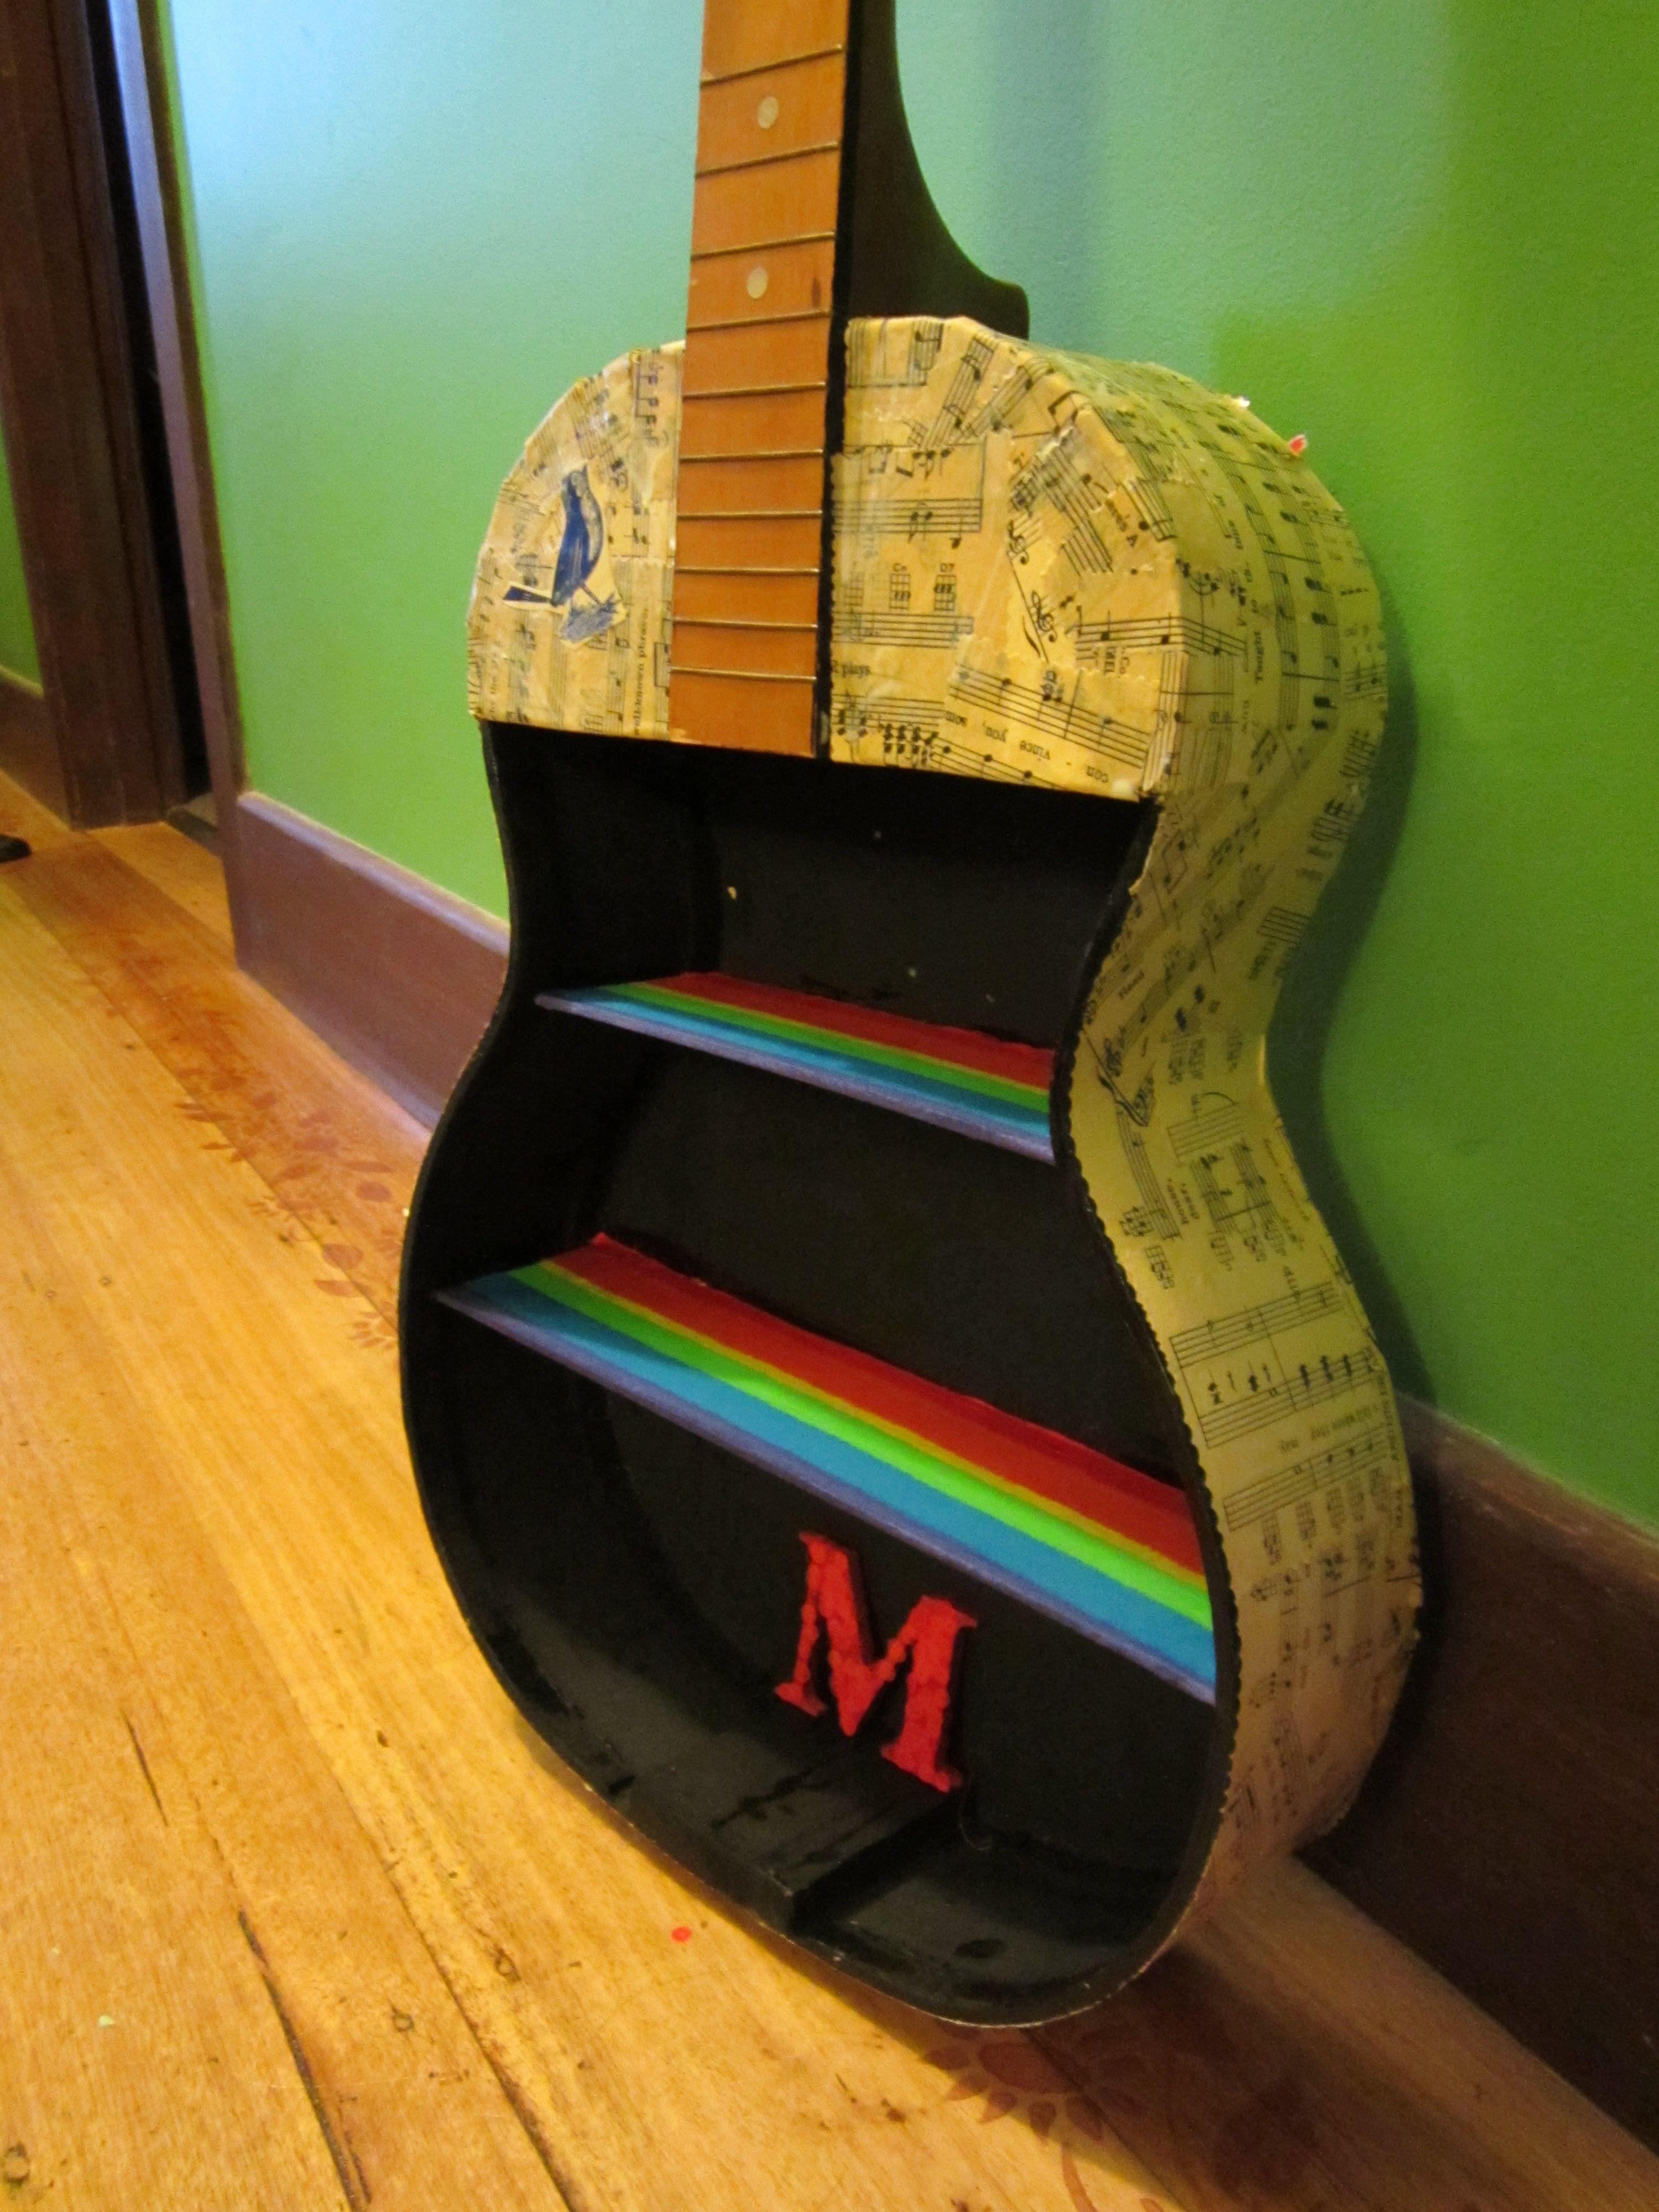 Guitar Shelf, Modge Podge Old Music Sheet To Outside Of